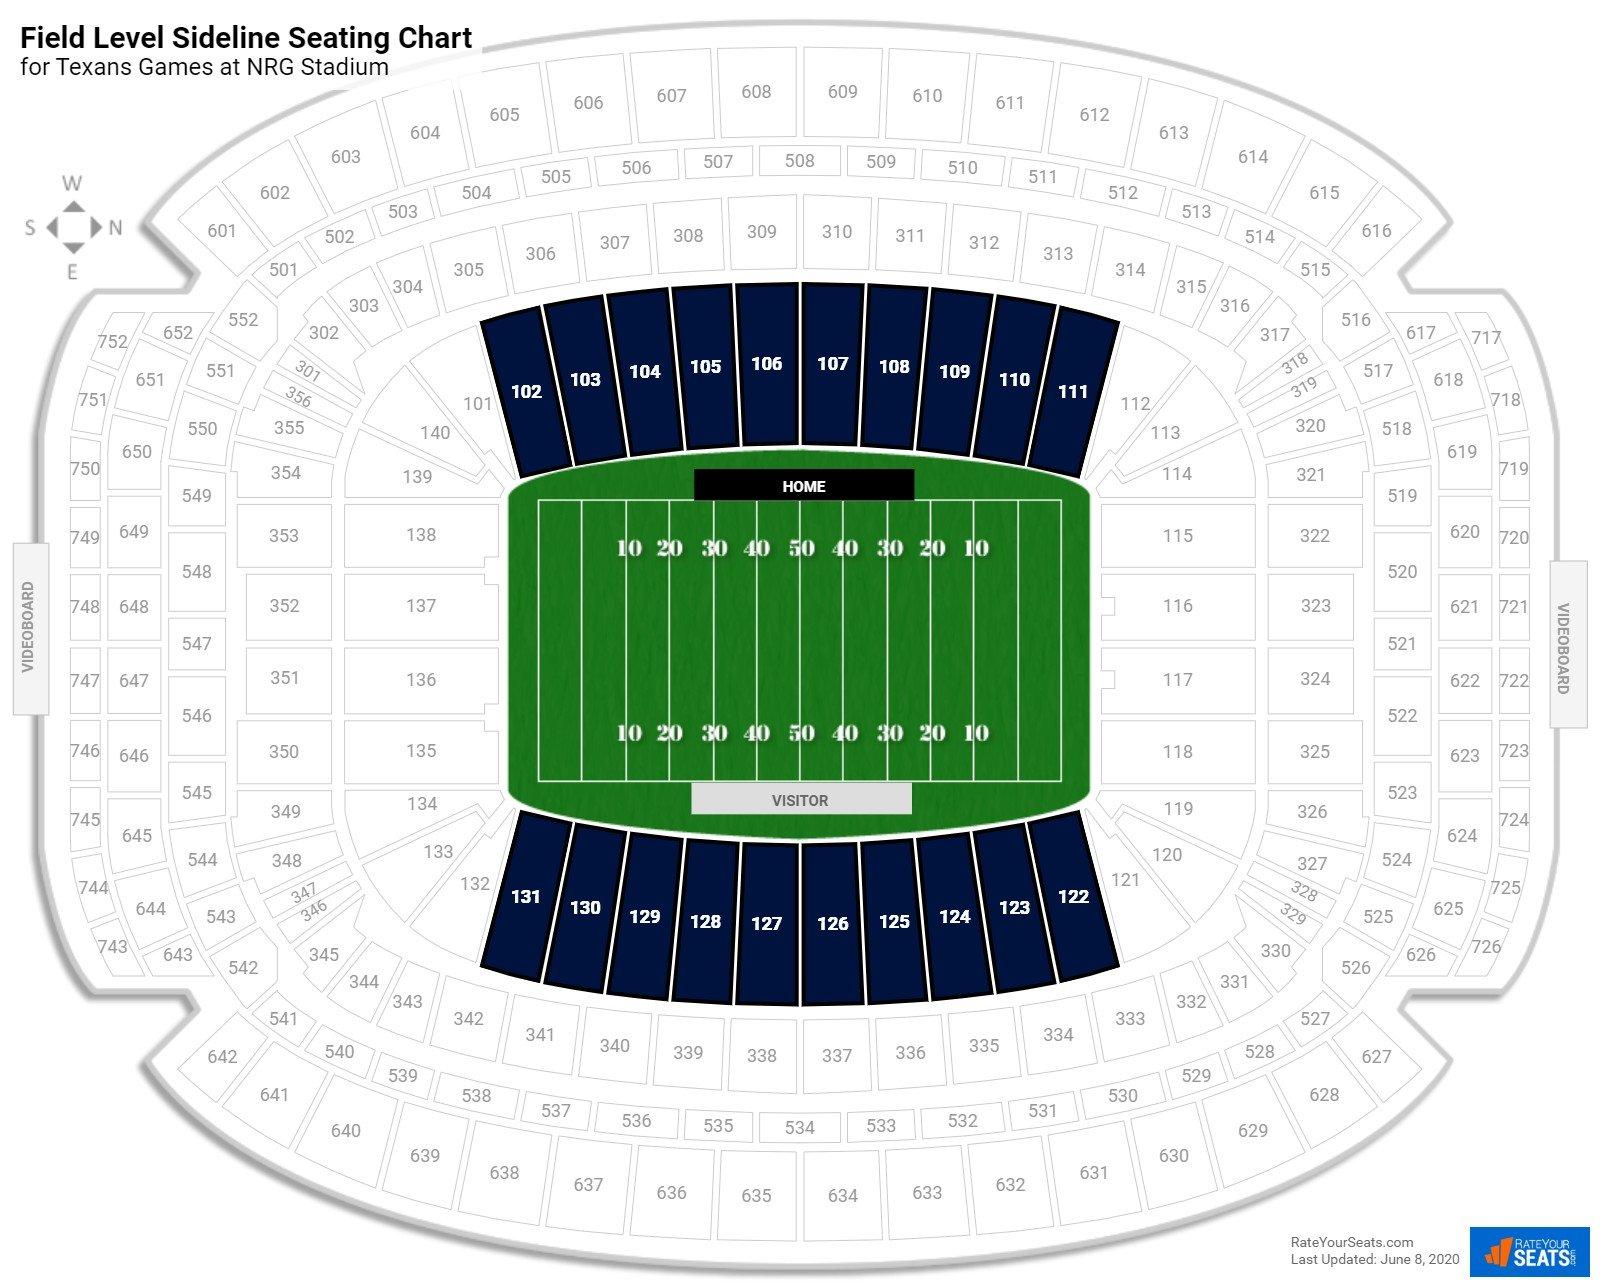 Field Level Sideline Nrg Stadium Football Seating Rateyourseats Com